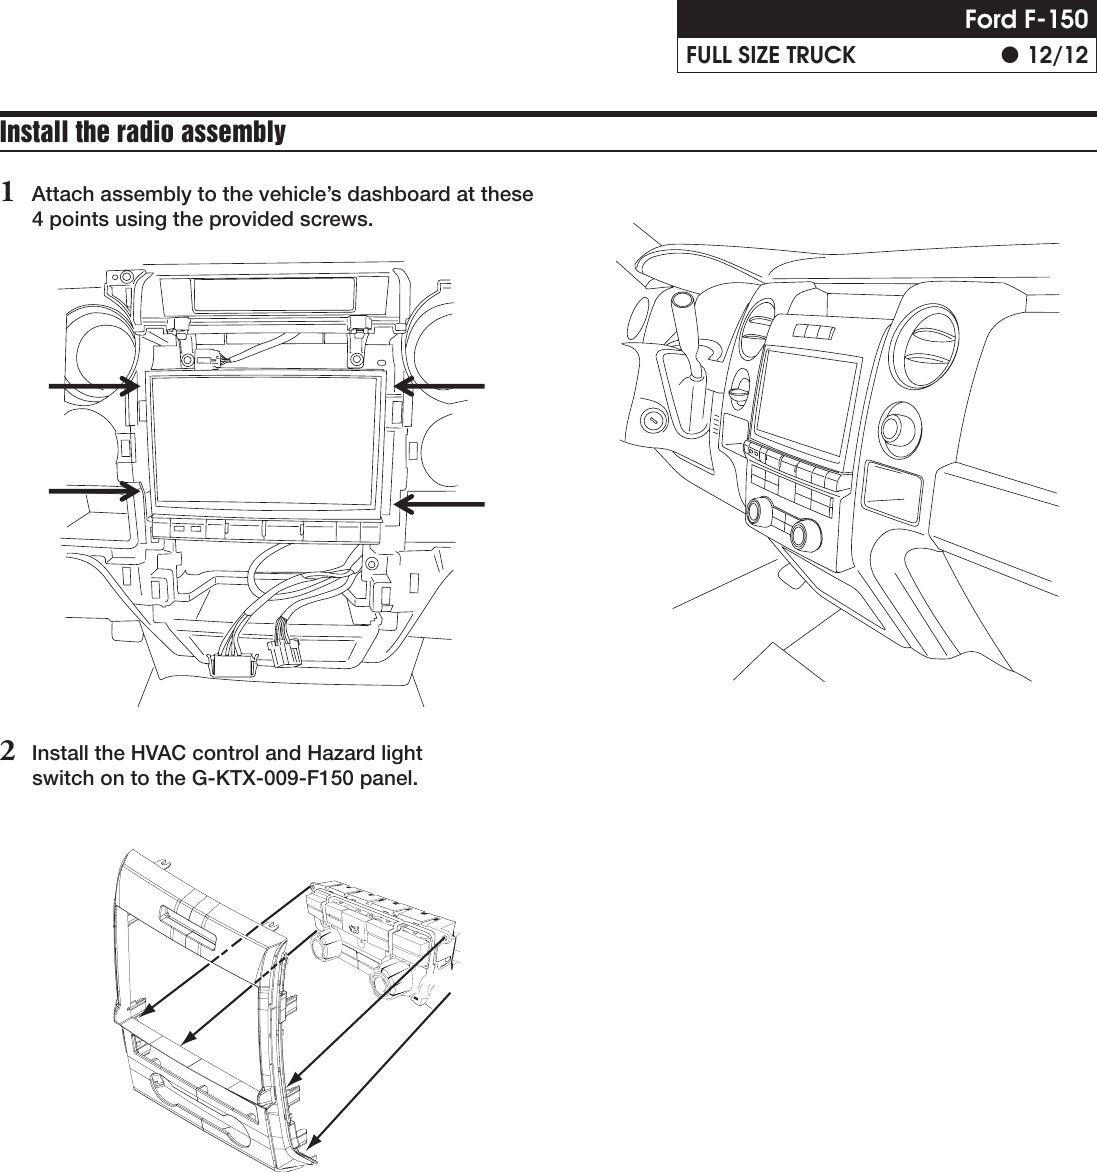 Alpine X009 Fd1 Installation Manual Car Audio Wiring Diagram F 150 Page 12 Of